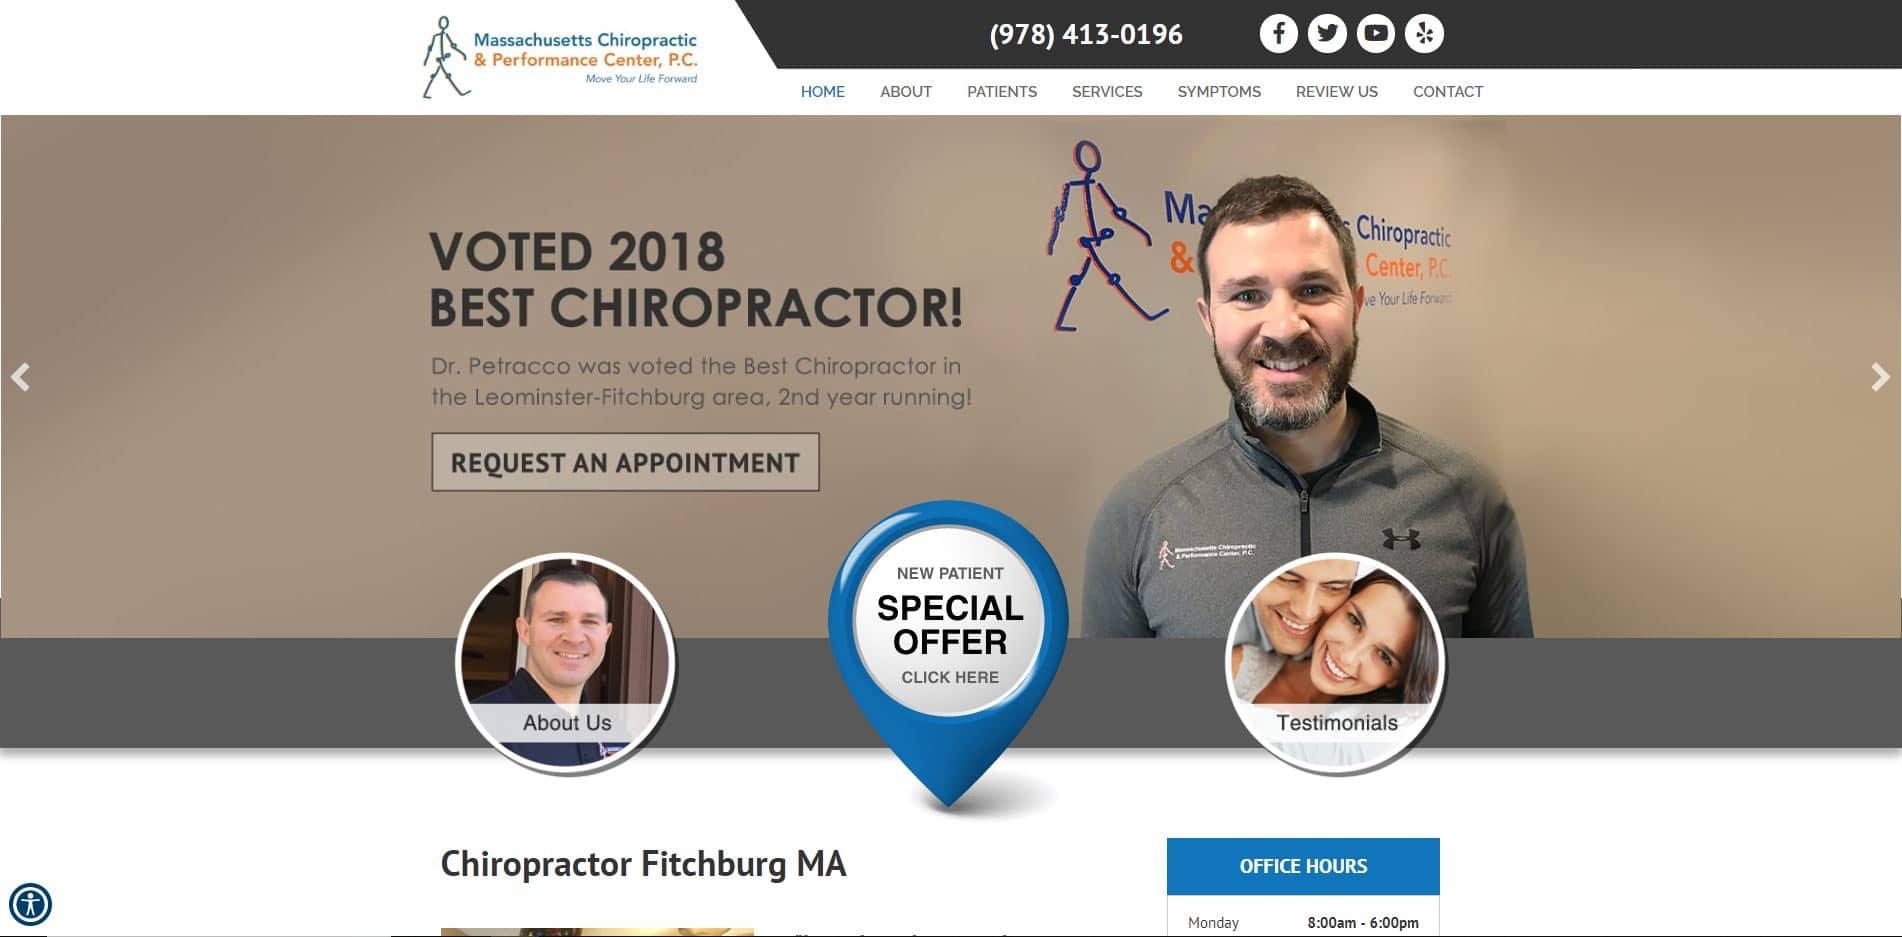 Chiropractor in Fitchburg